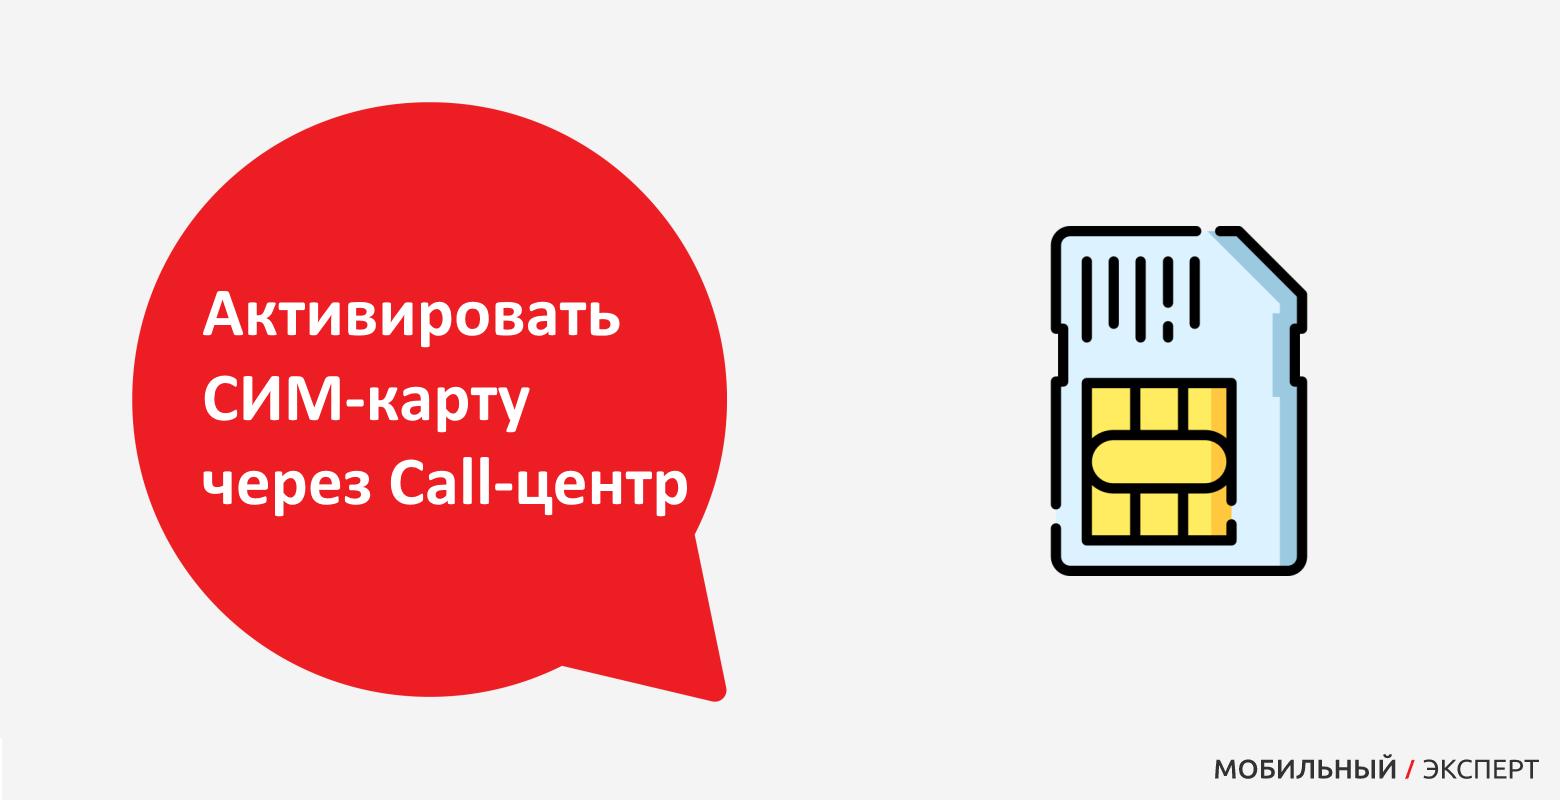 Активировать СИМ-карту через Call-центр